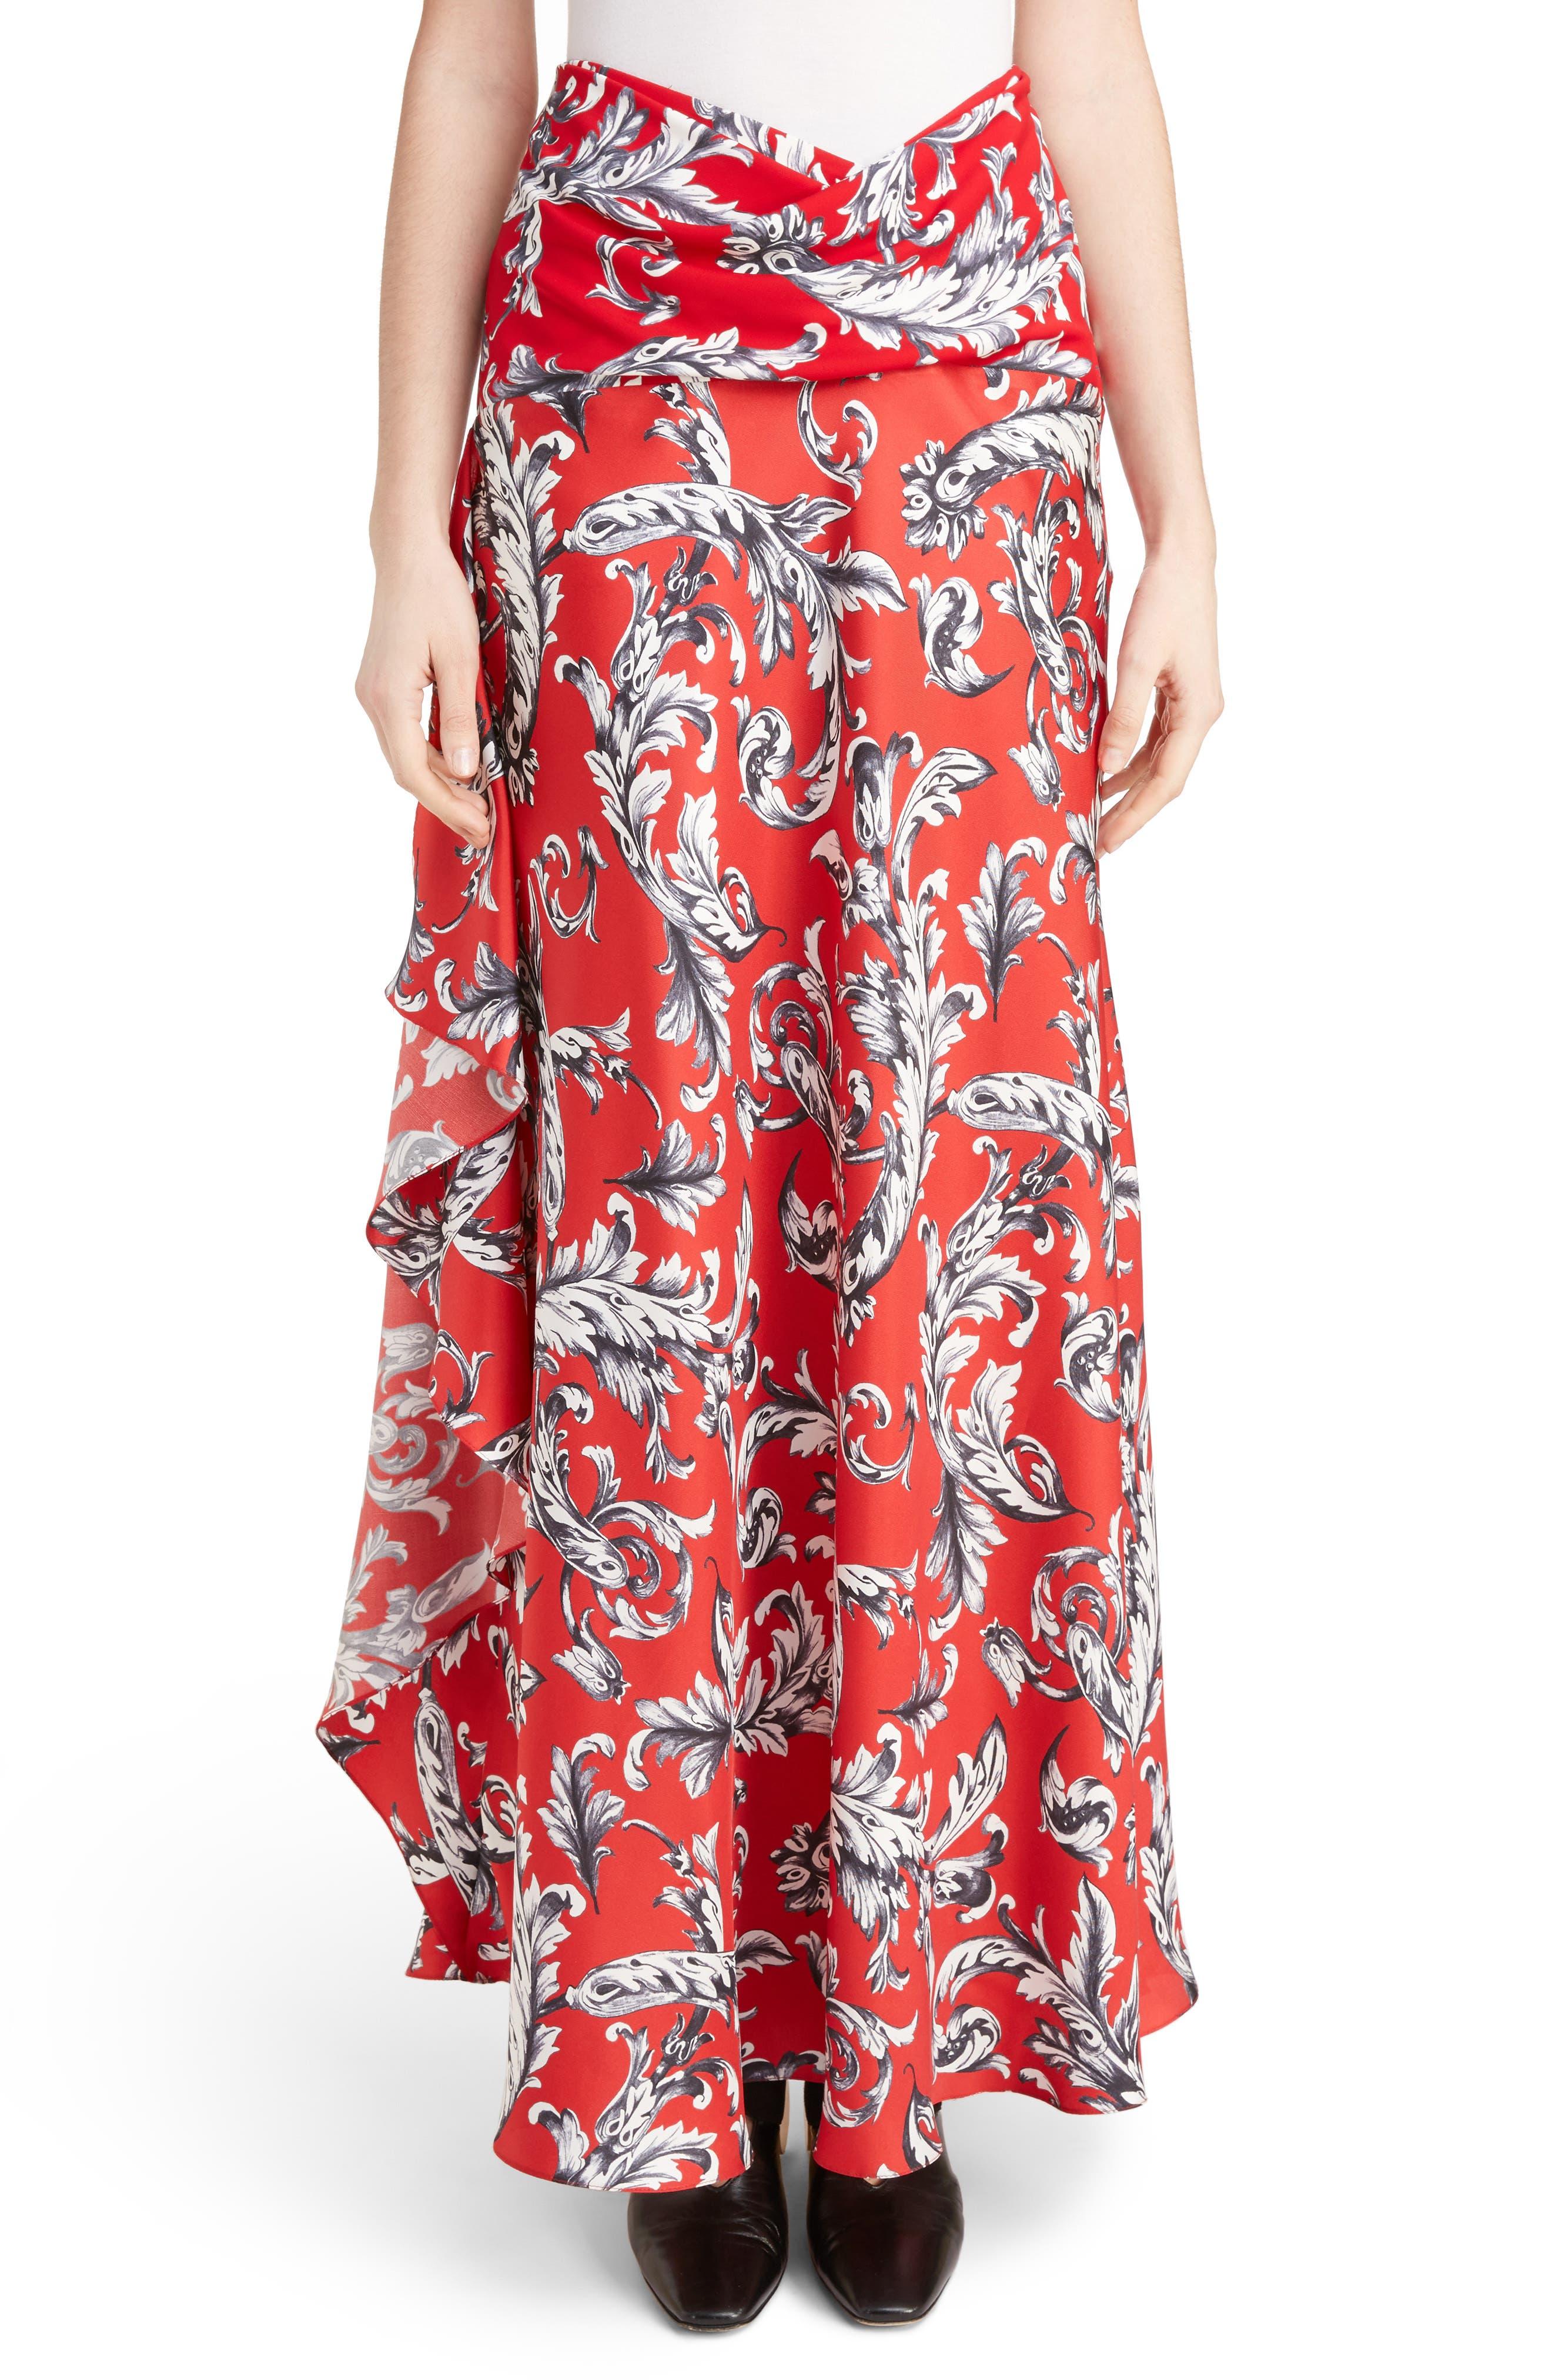 J.W.ANDERSON Filigree Print Asymmetrical Maxi Skirt,                         Main,                         color,